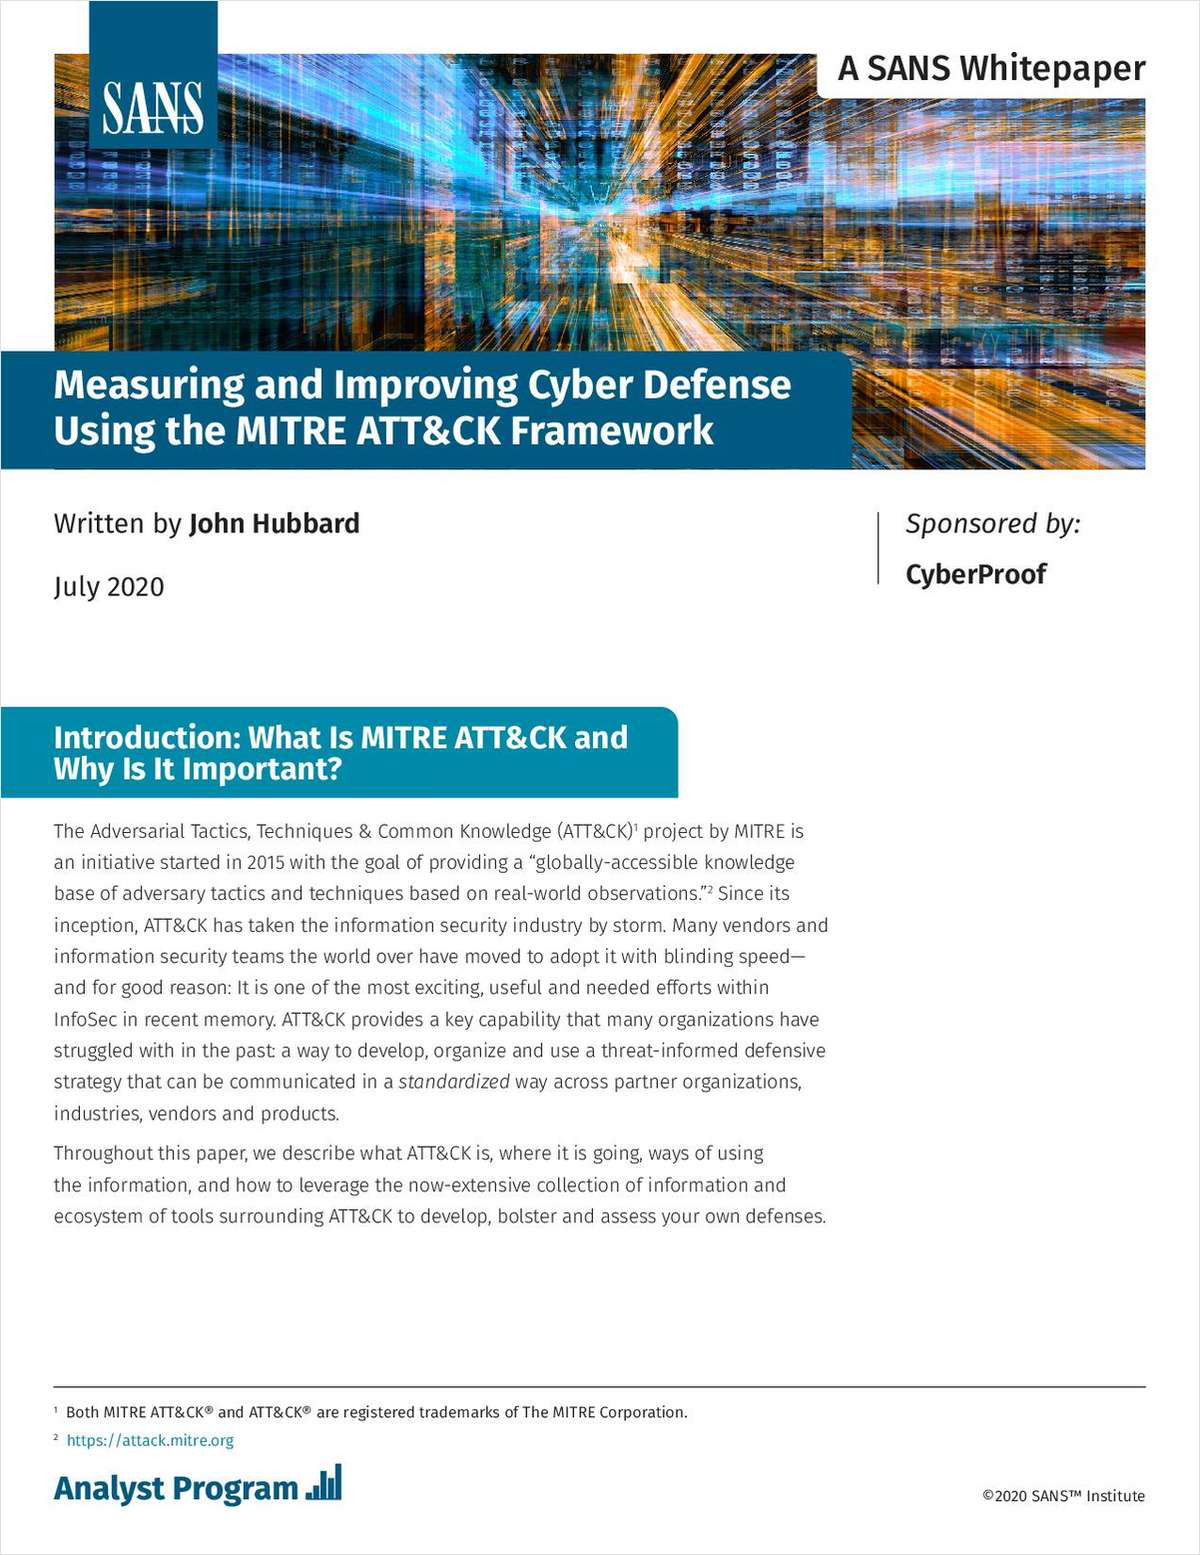 Measuring and Improving Cyber Defense Using the MITRE ATT&CK Framework